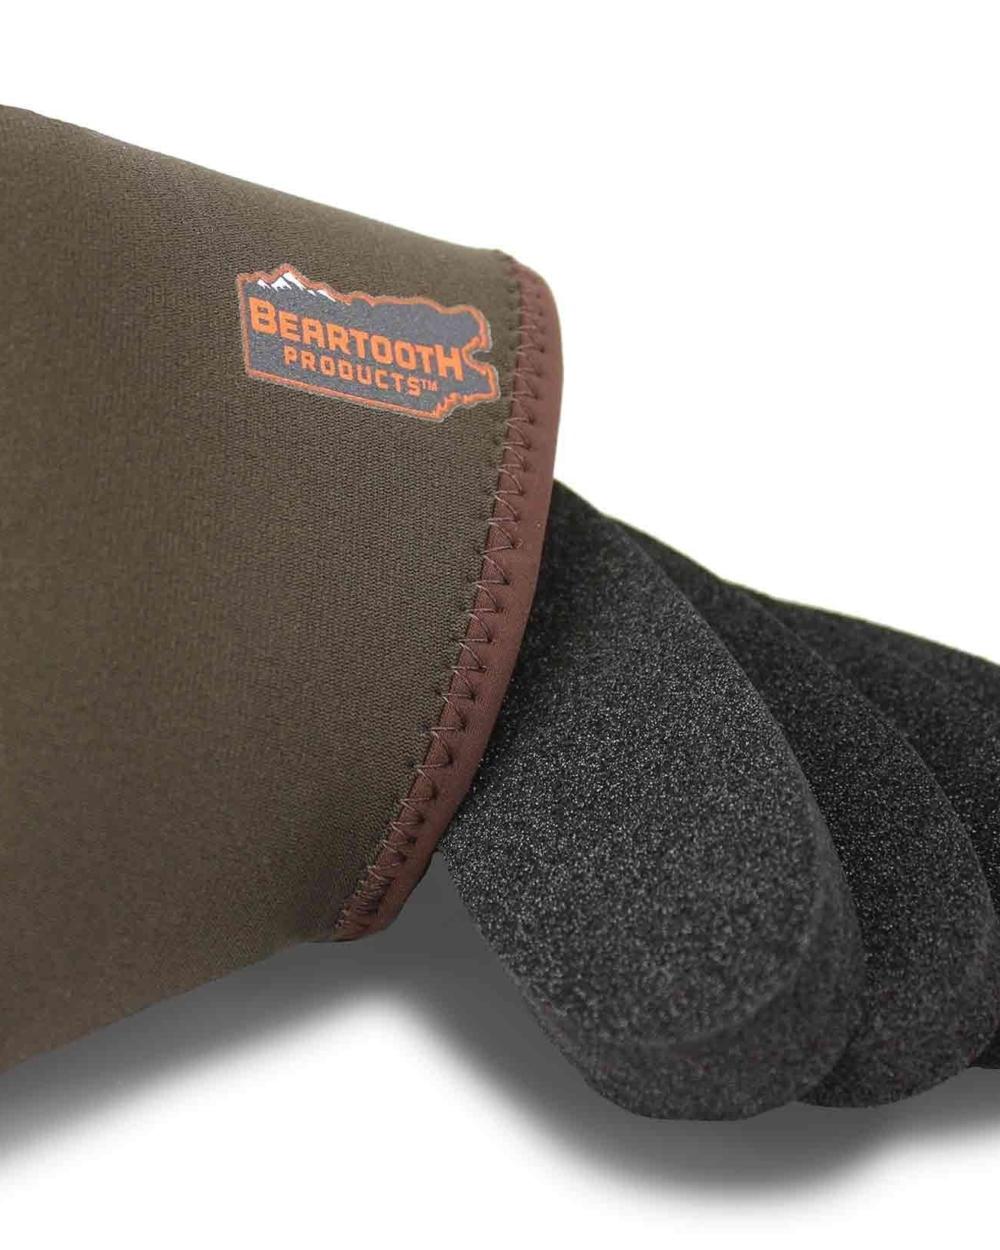 Beartooth Recoil Pad Kit